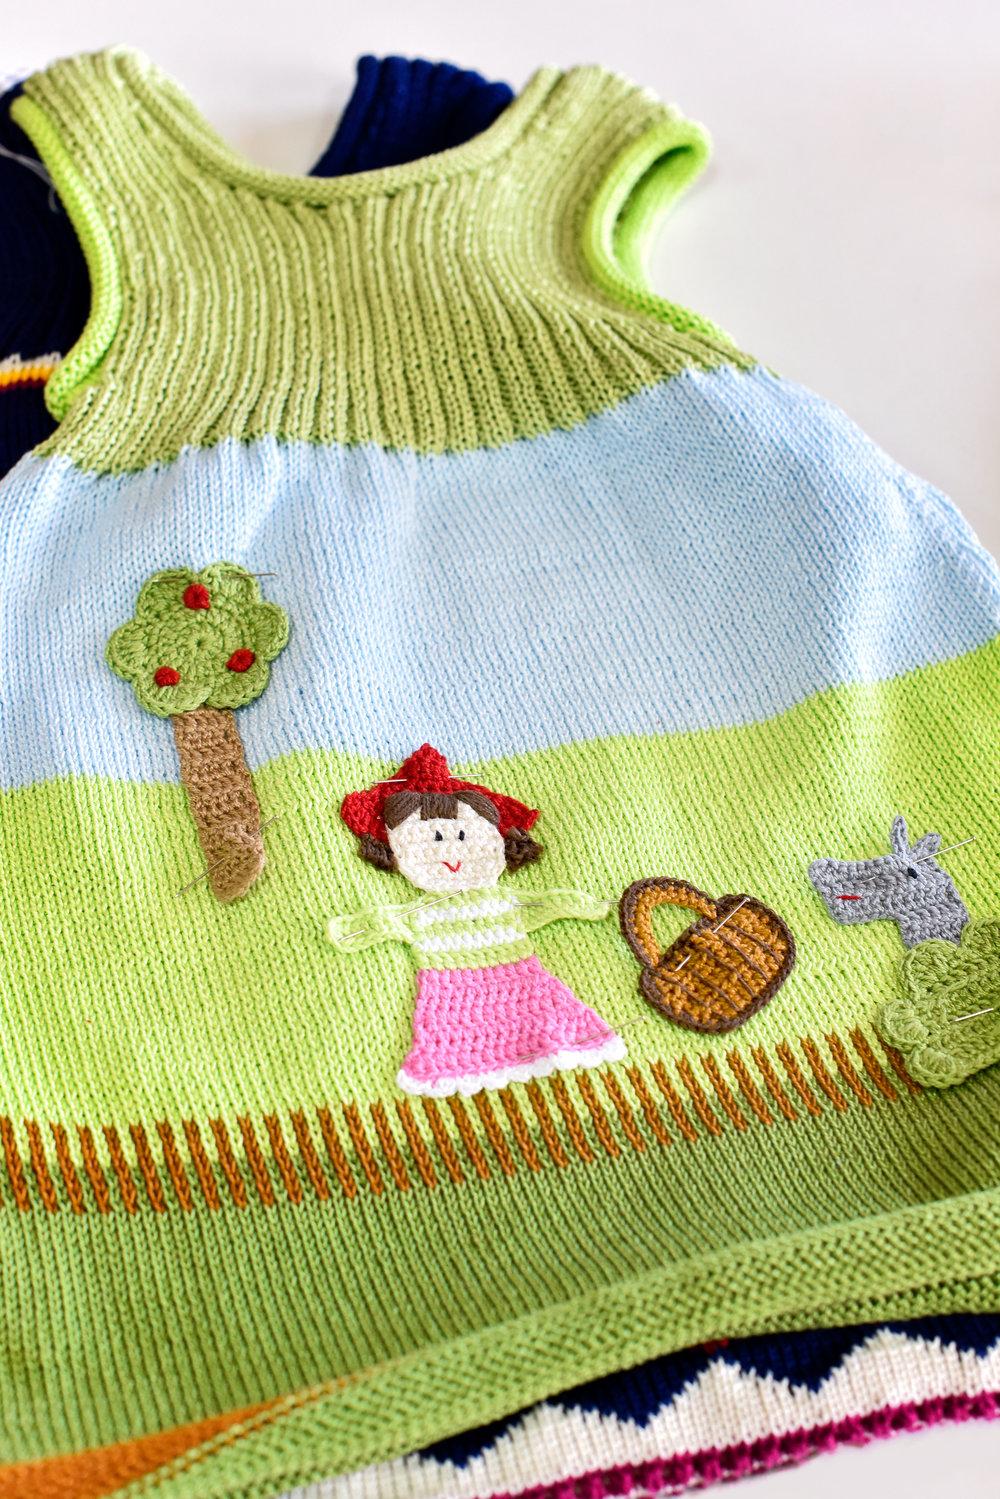 Handmade children's clothing for European retailers